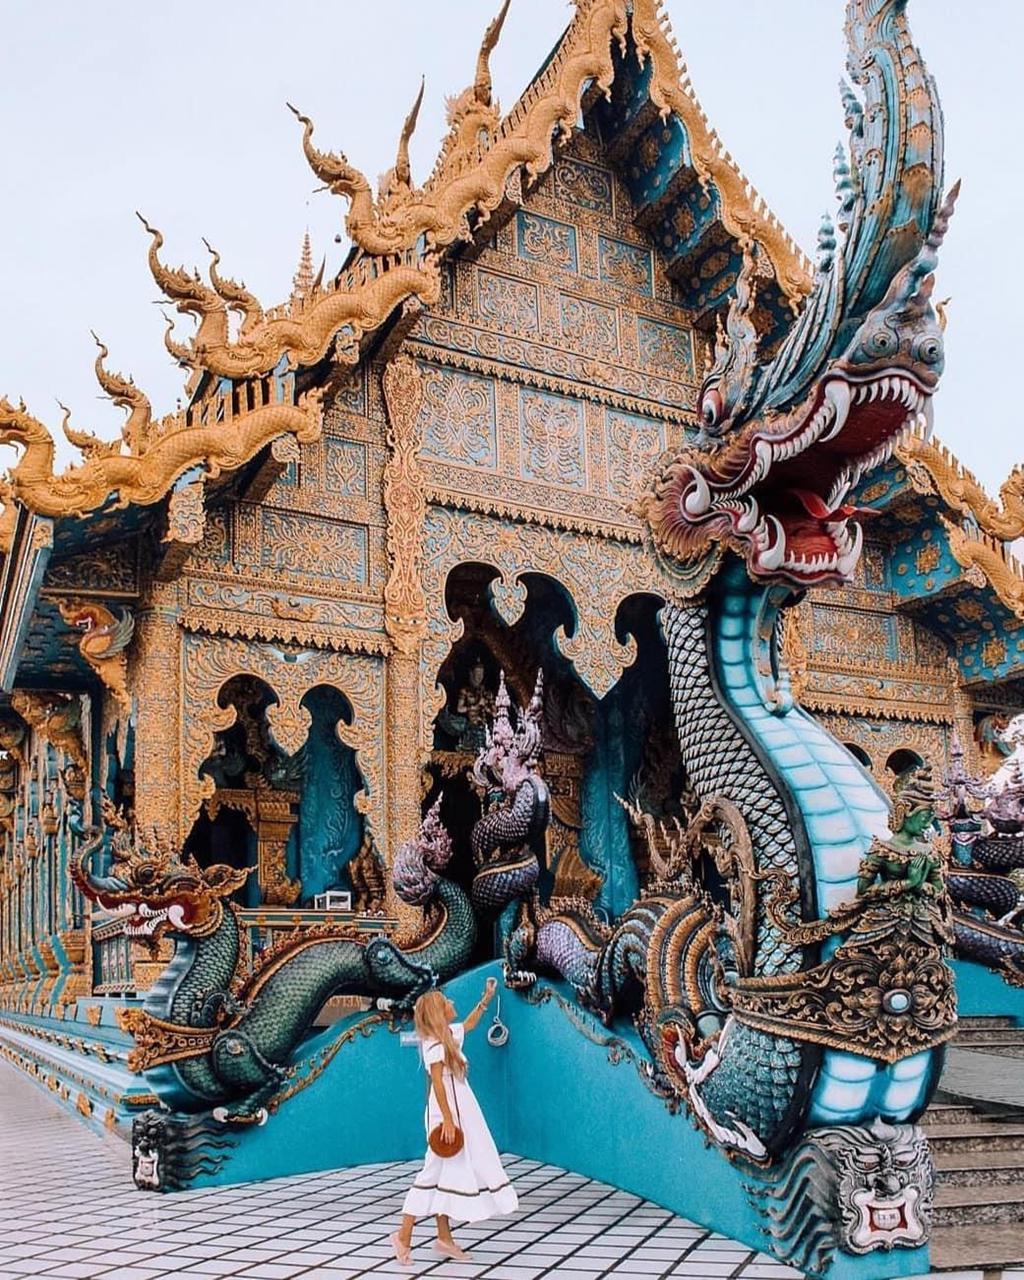 ghe-thai-lan-check-in-song-ao-tai-ngoi-chua-xanh-dat-vang-sang-chanh-ivivu-12